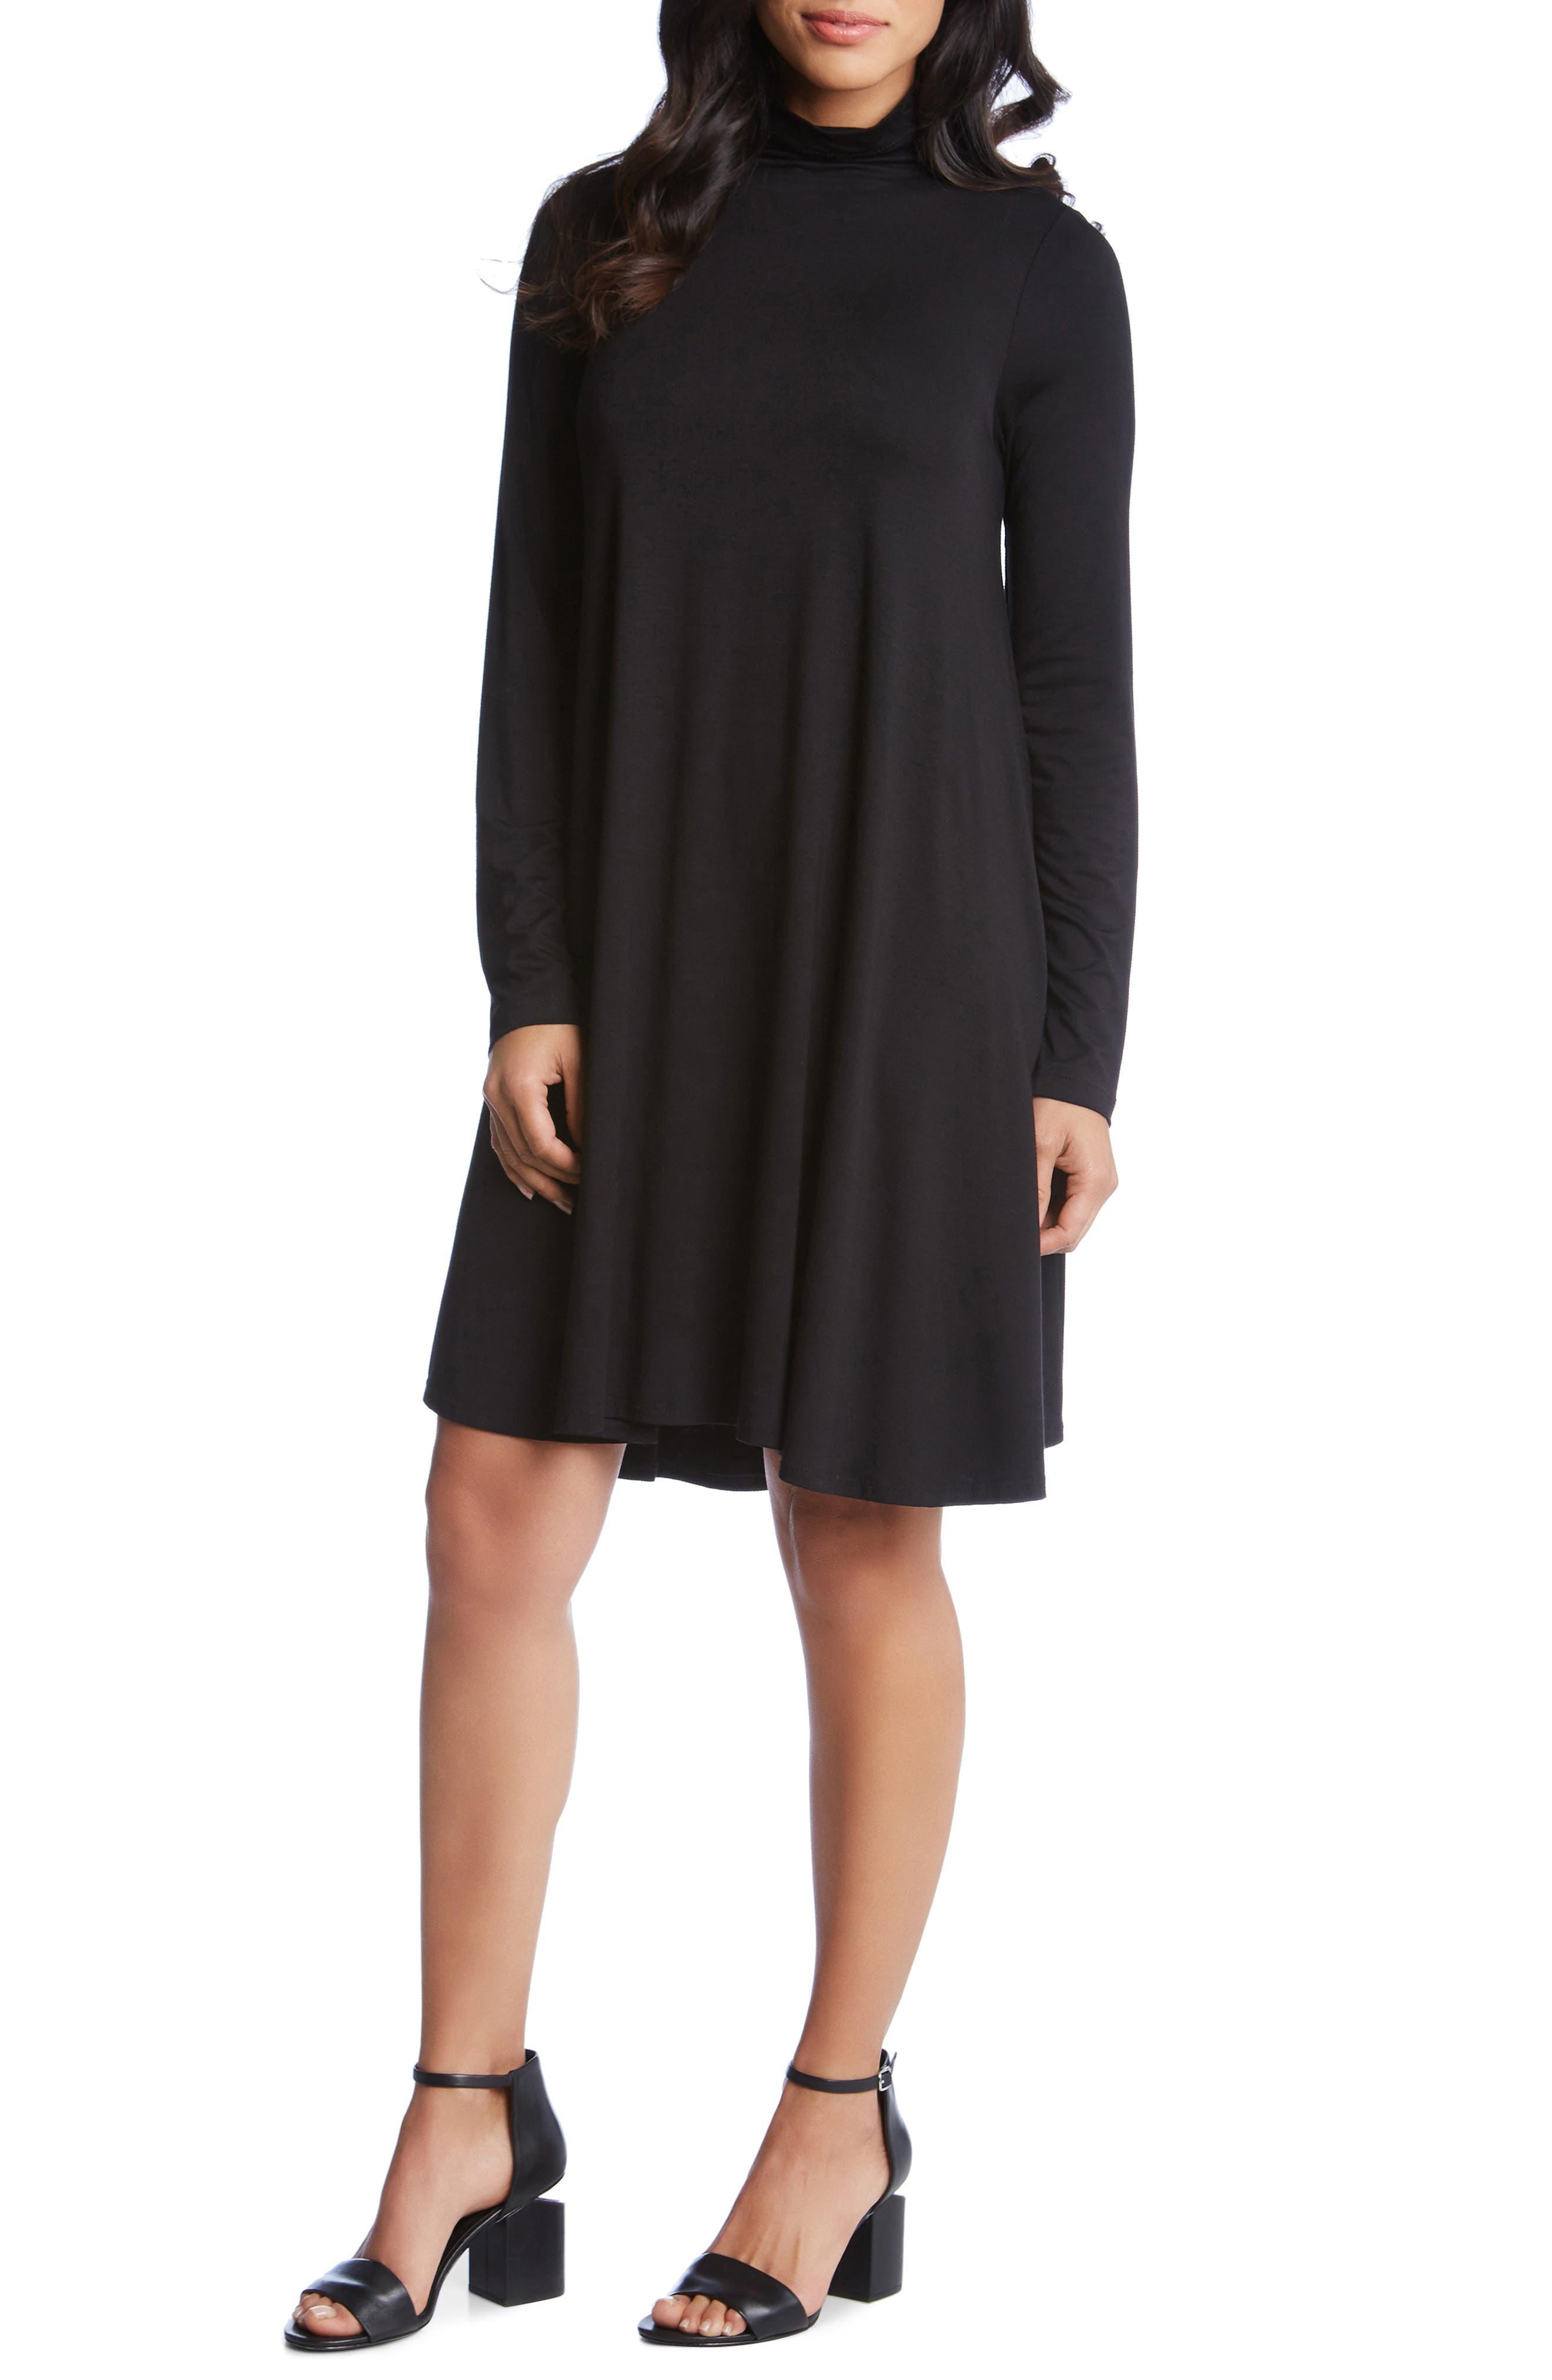 KAREN KANE, Maggie Turtleneck Trapeze Dress, Main thumbnail 1, color, BLACK